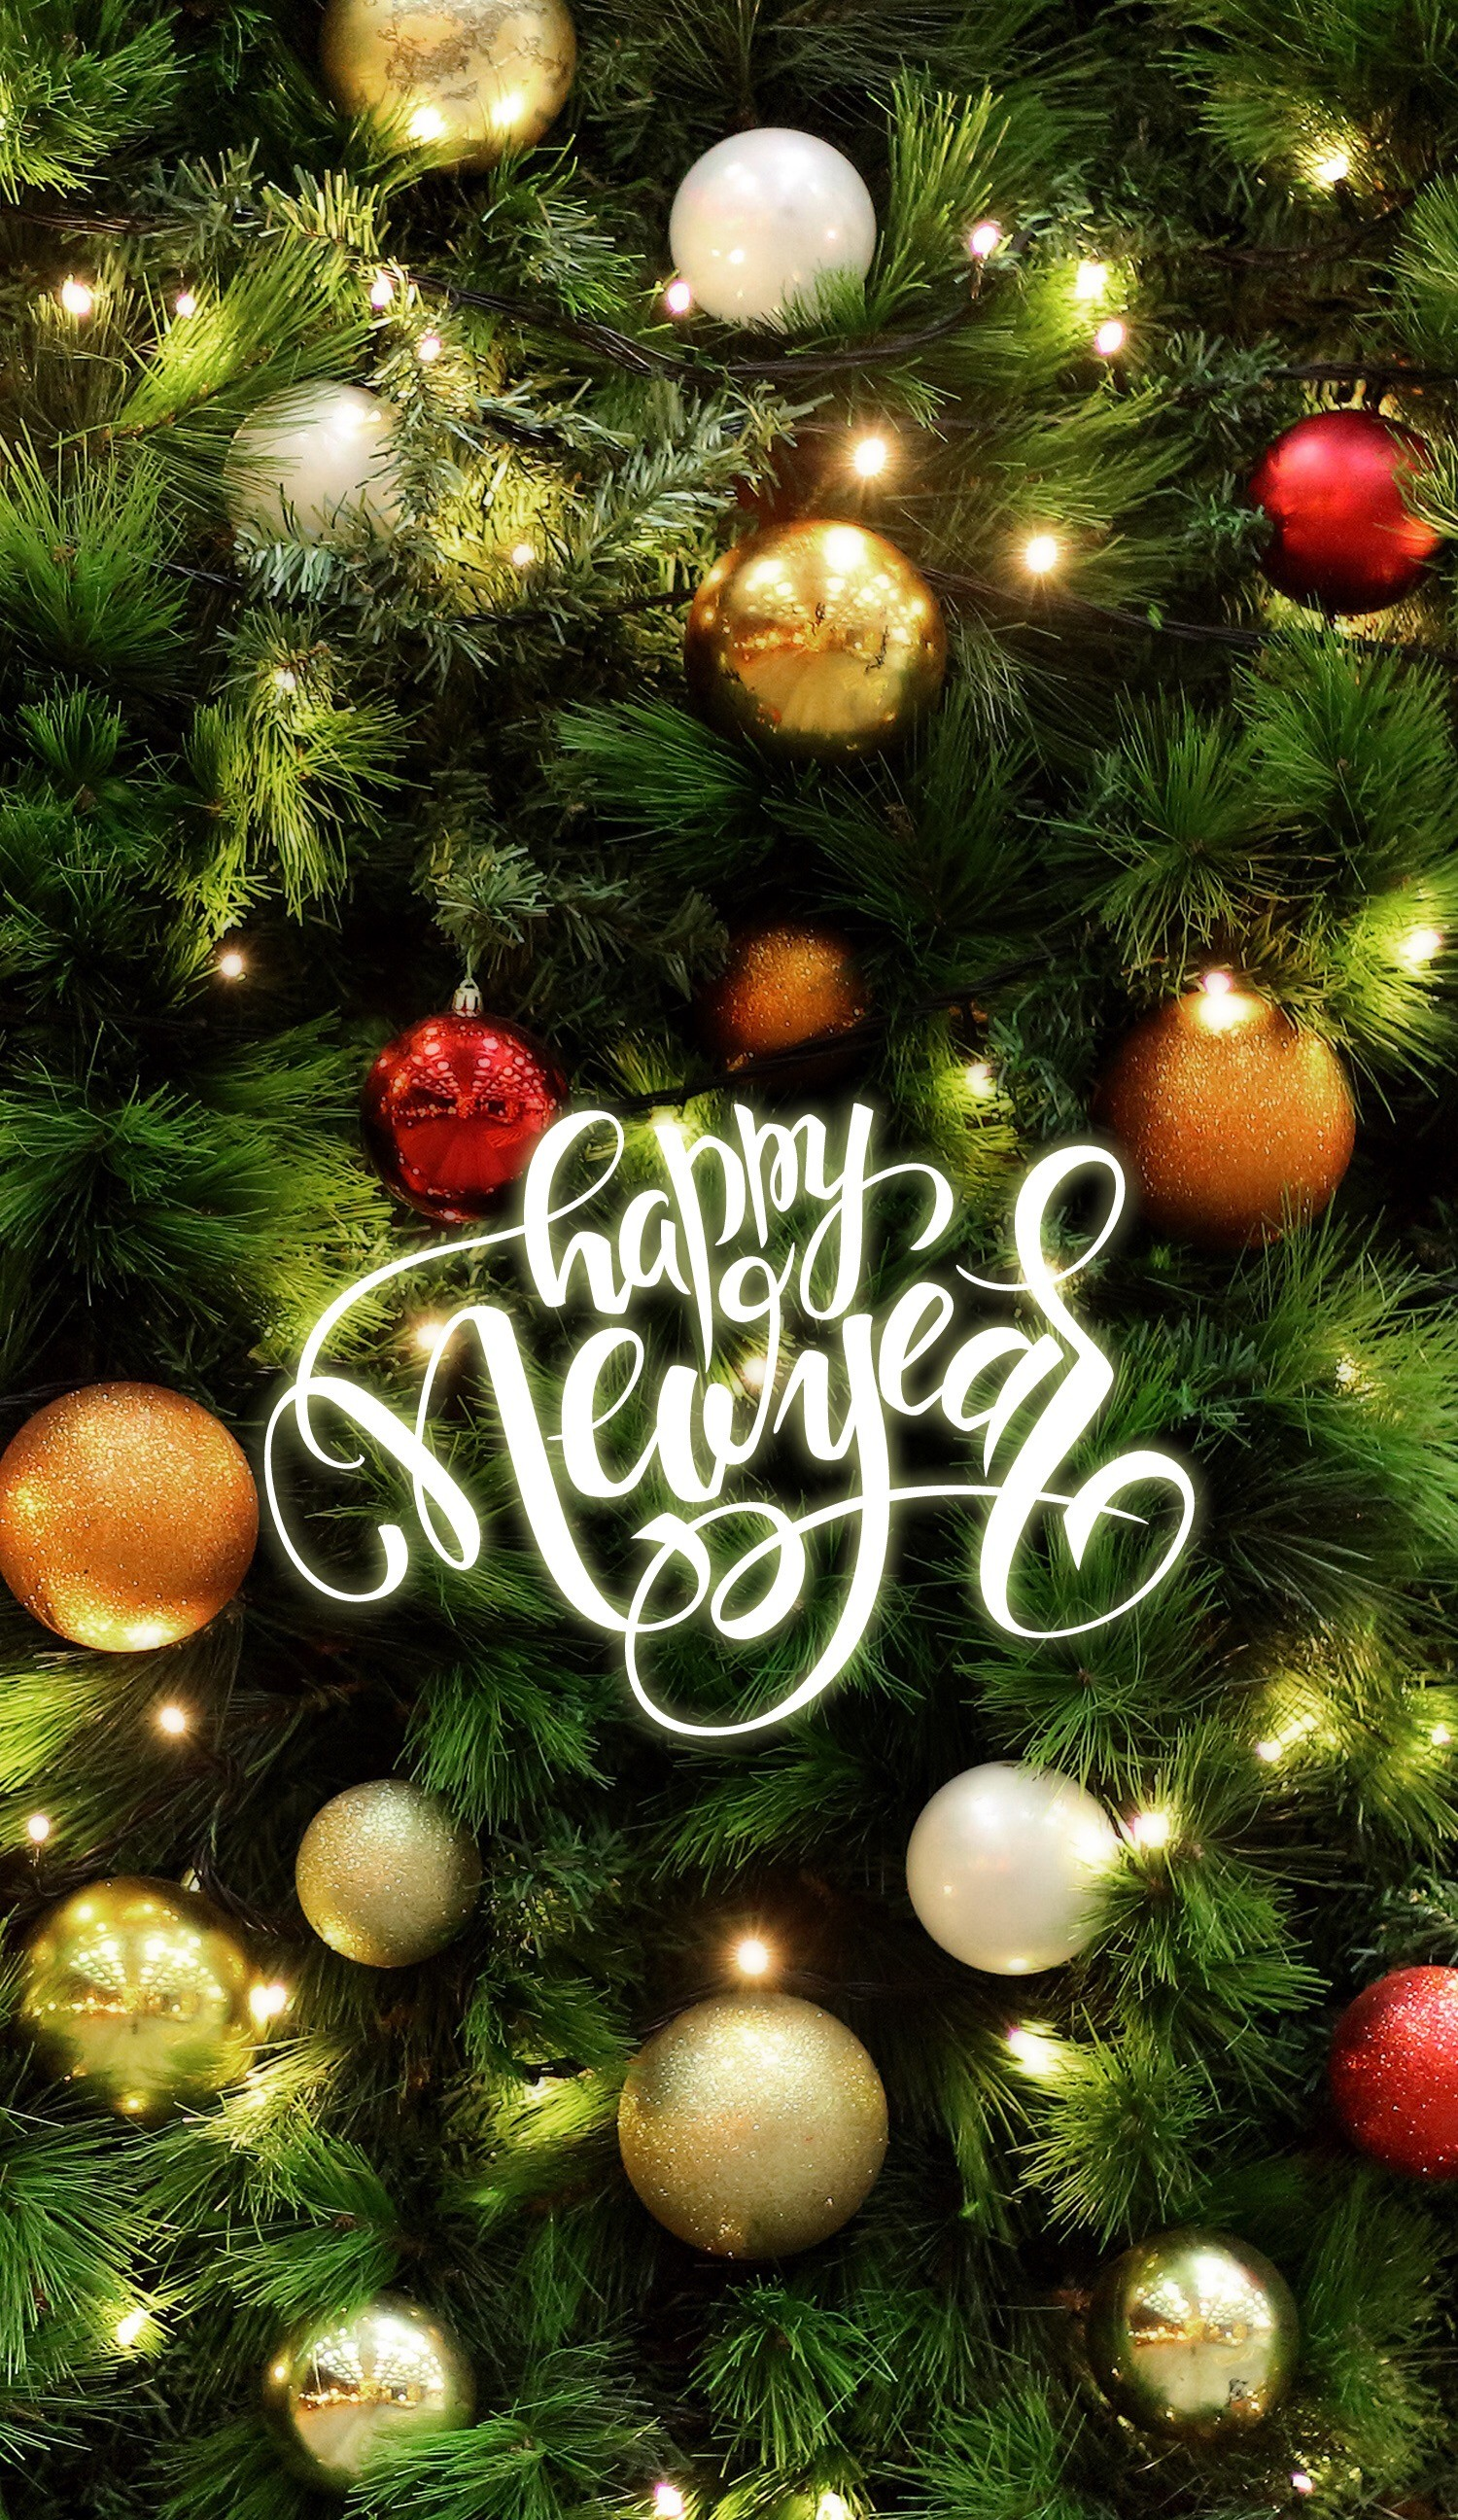 Wallpaper Iphone/holidays/happy New Year šª   Data - Christmas Tree Lights Balls - HD Wallpaper